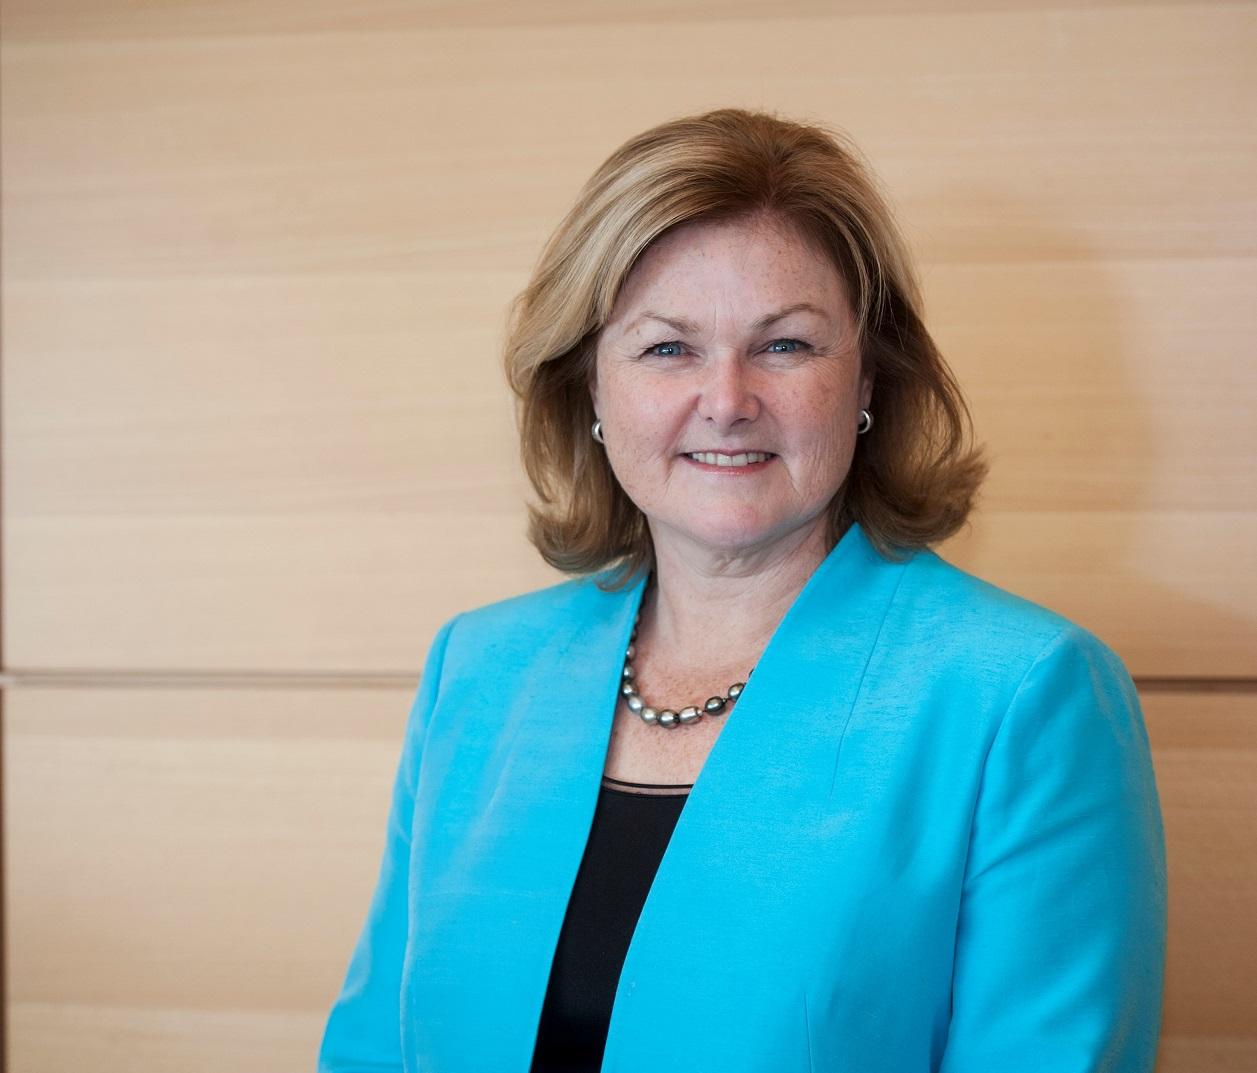 La professeure Barbara Orser